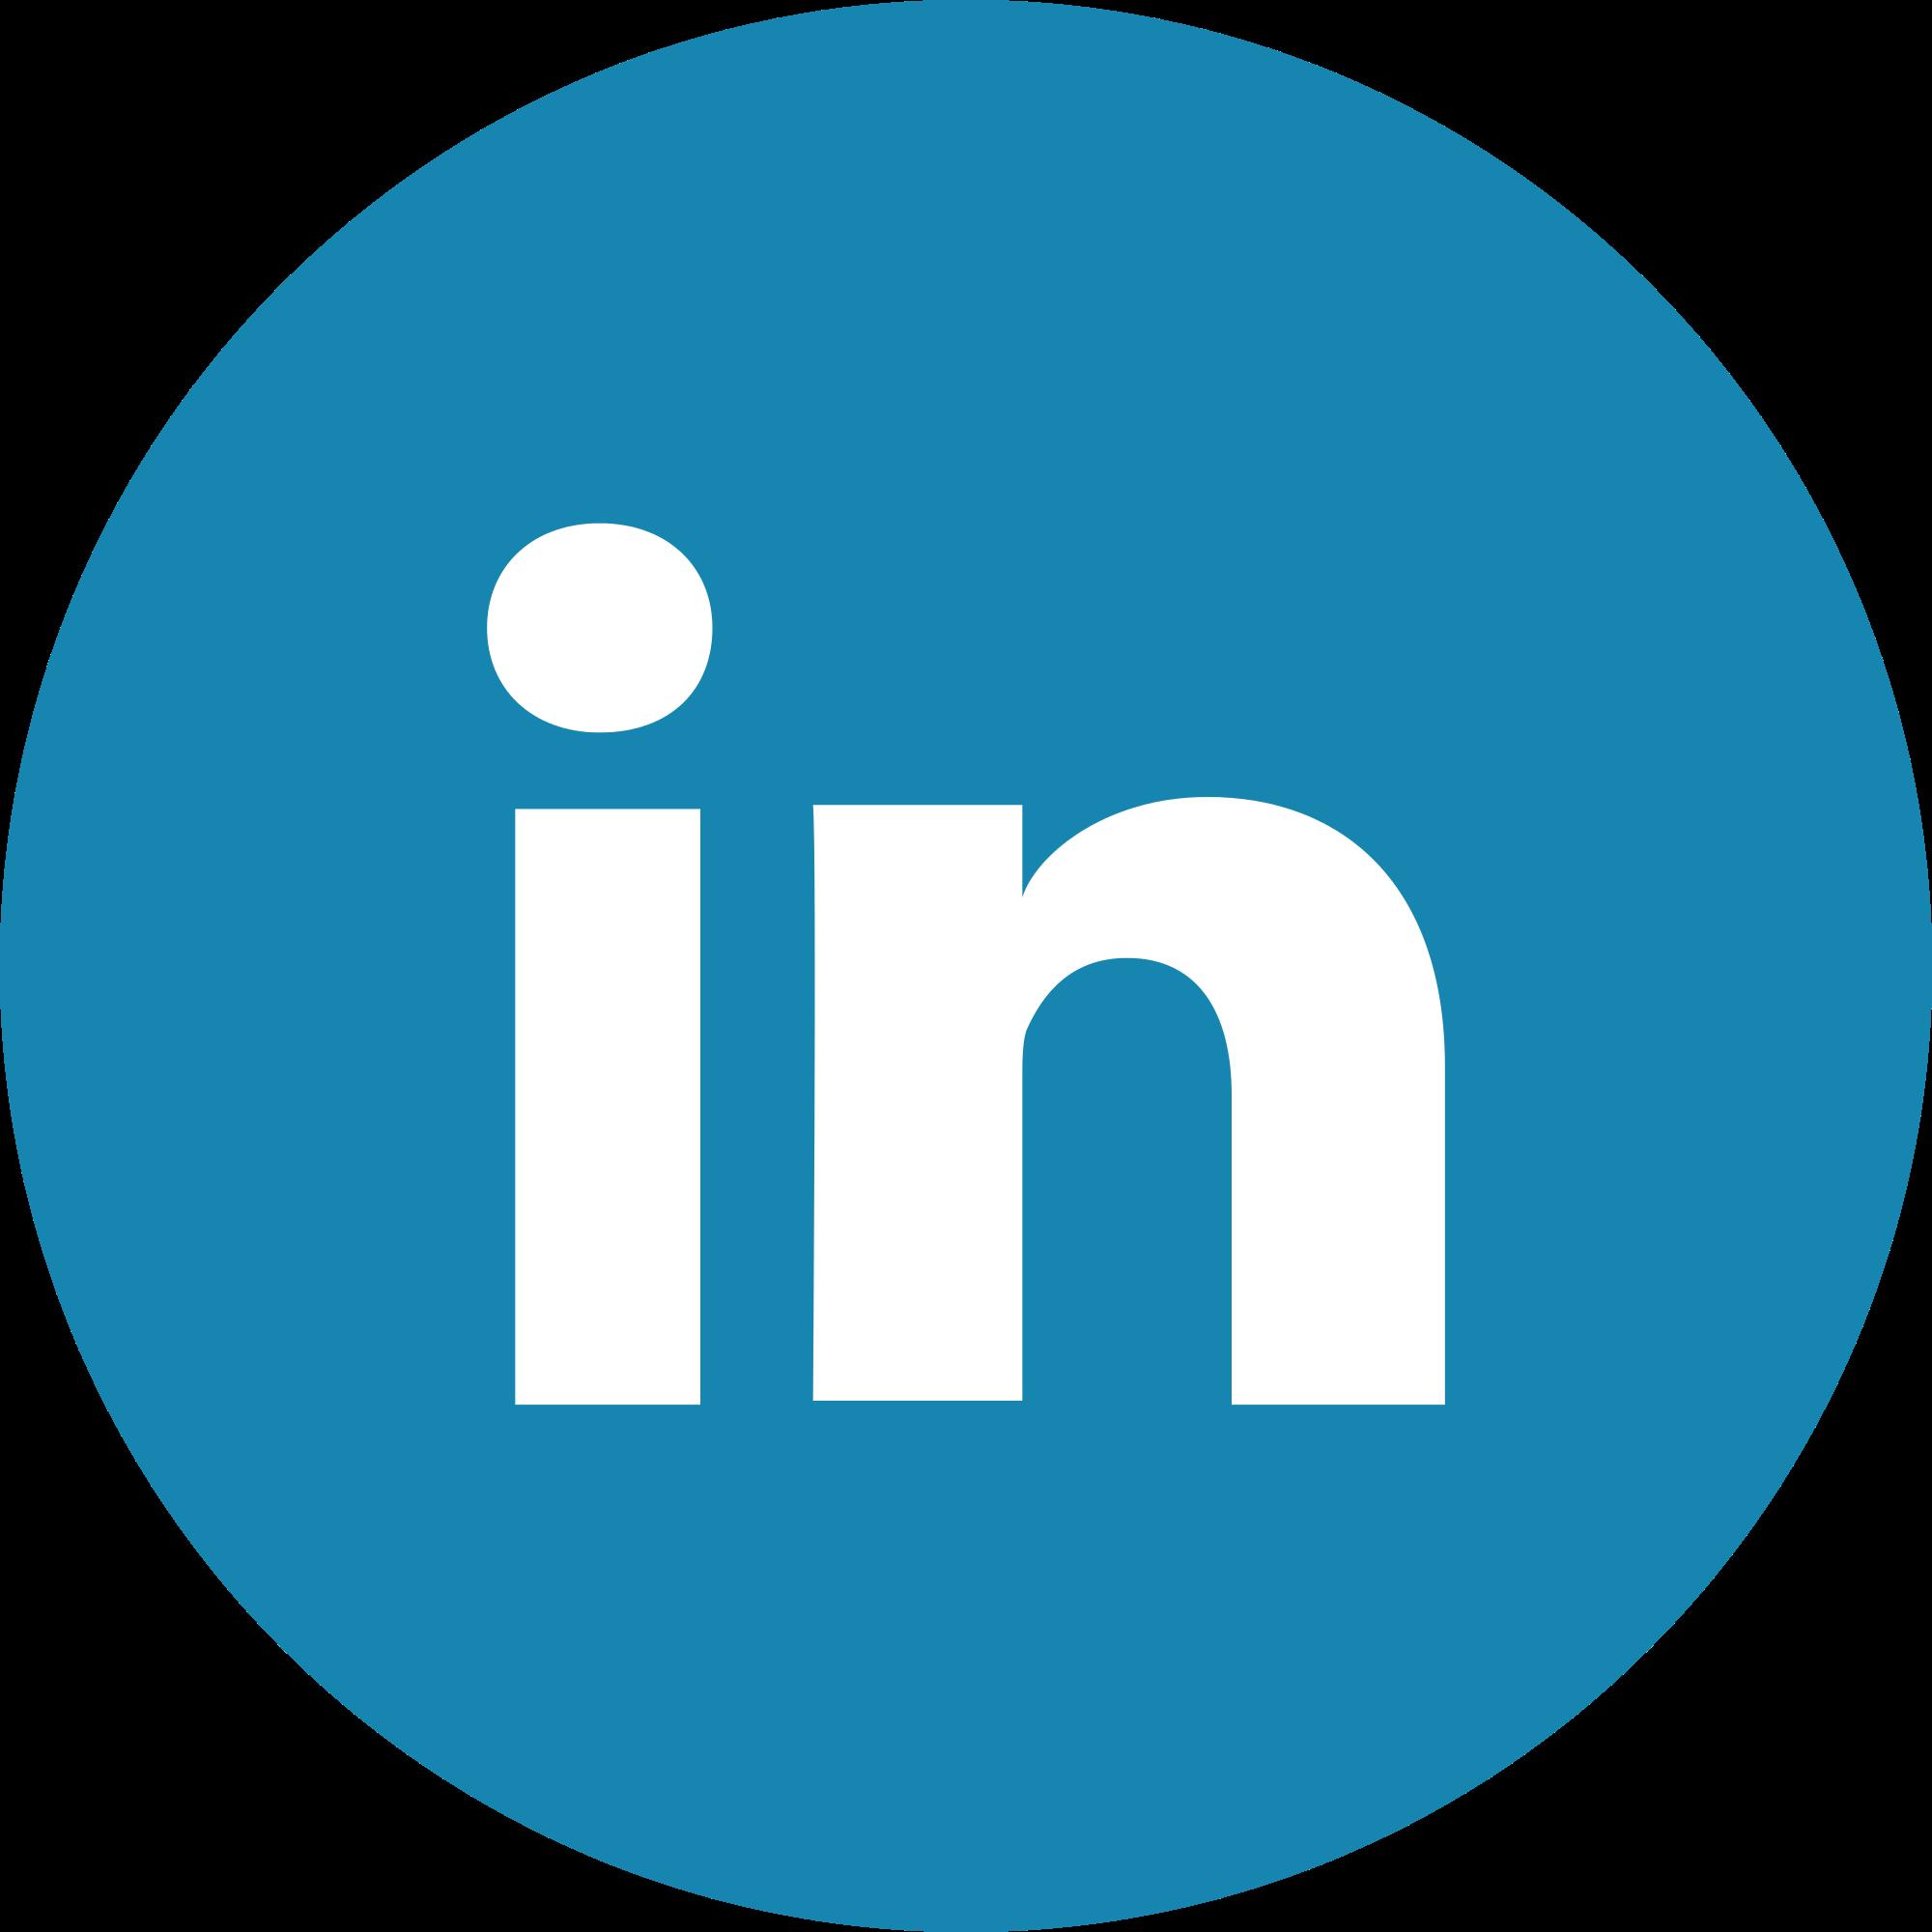 Linkedin circle